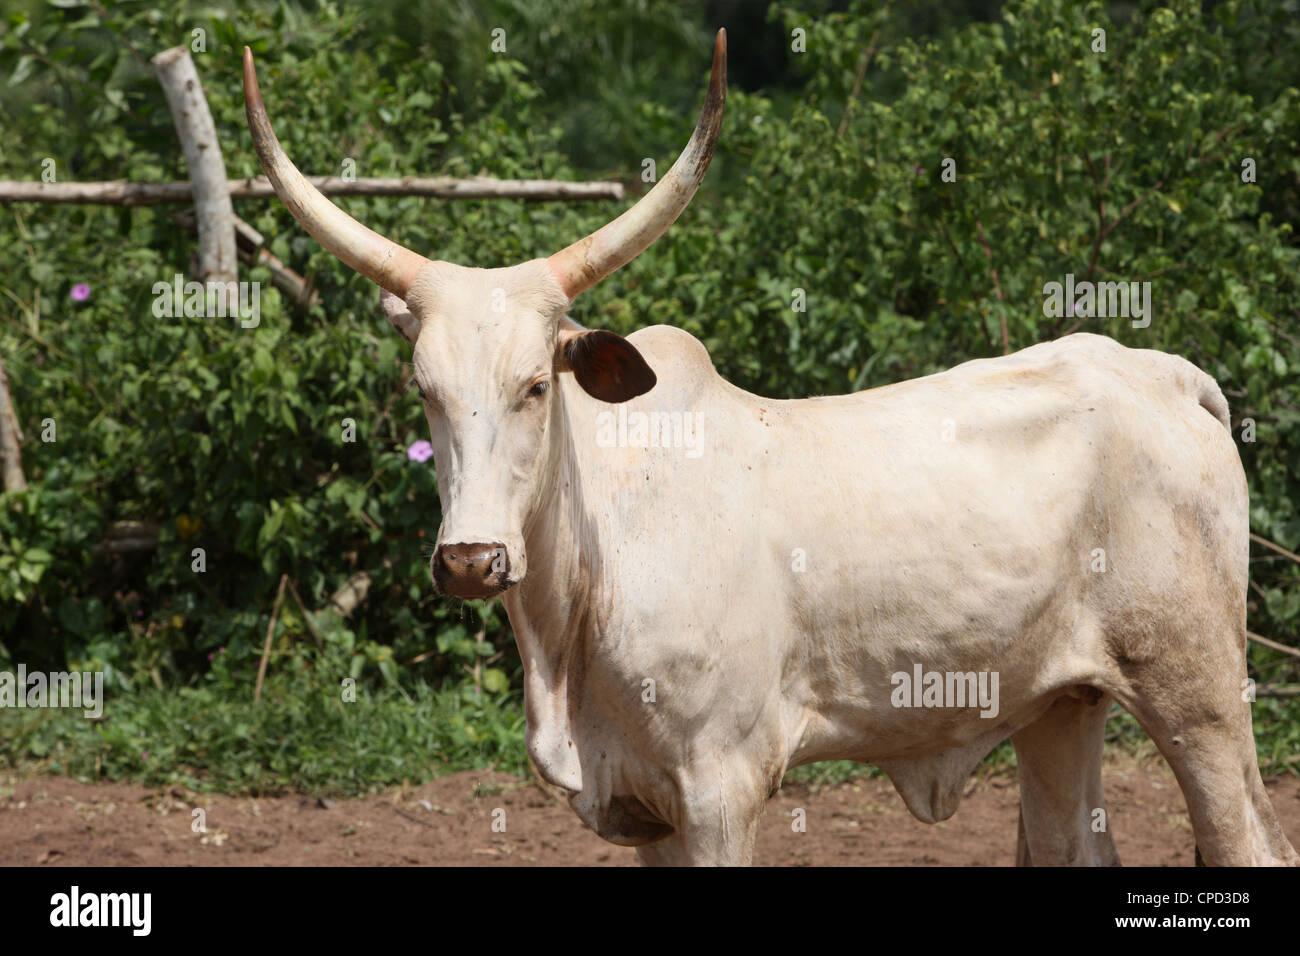 Cattle ranch, Tori, Benin, West Africa, Africa - Stock Image